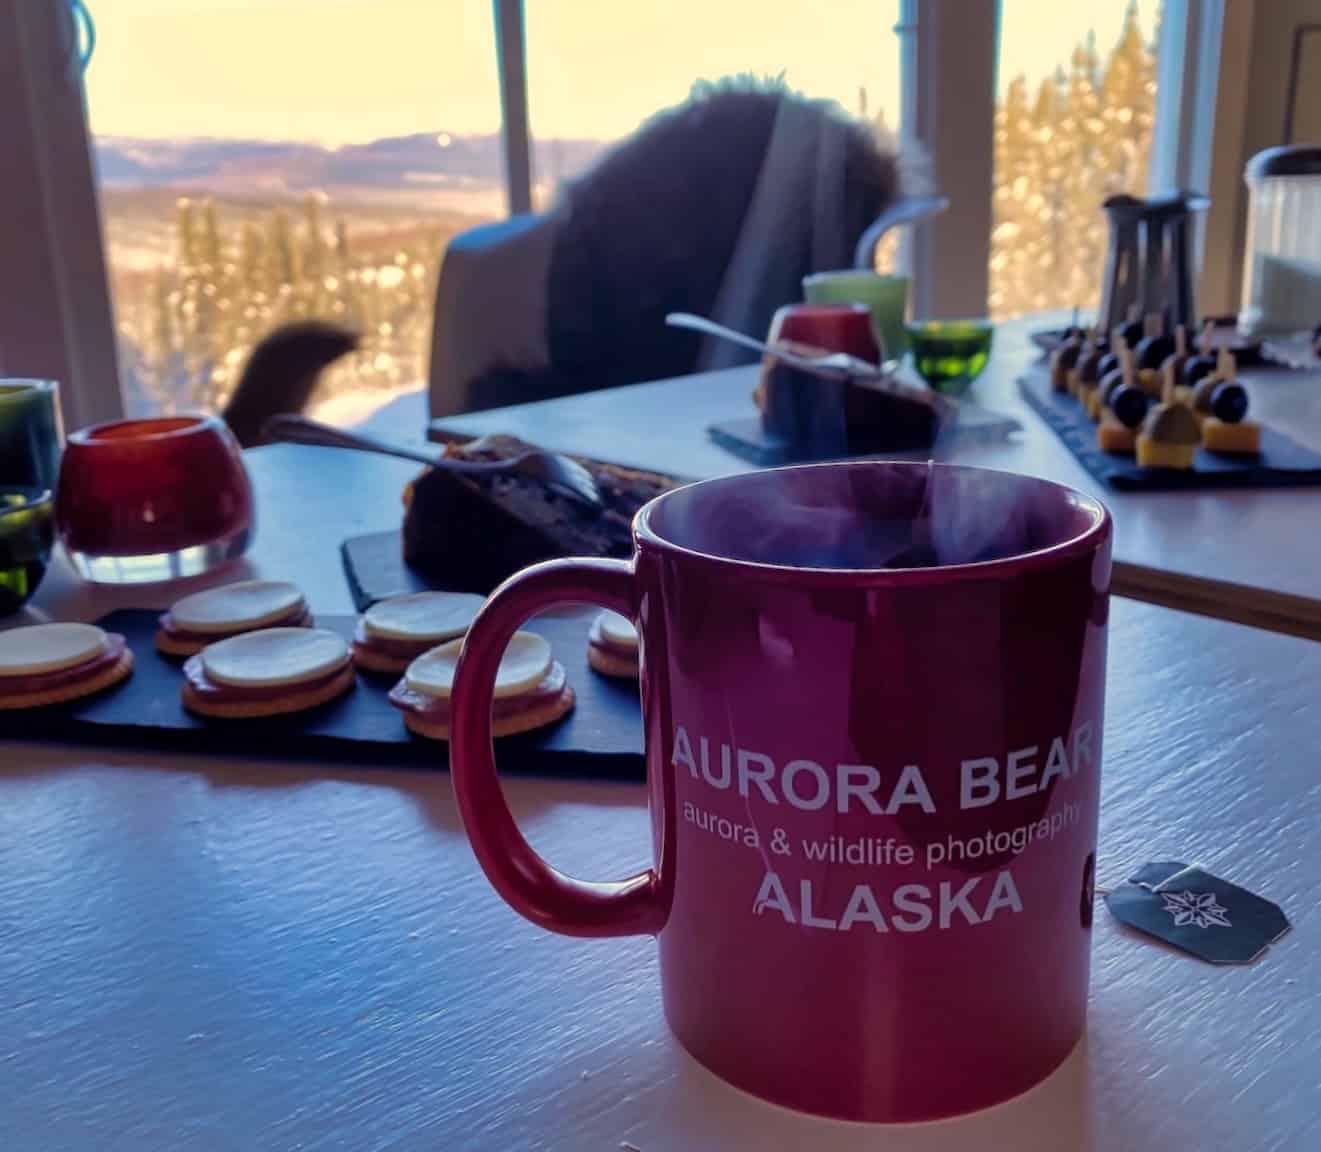 Alaska Aurora - Aurora Bear